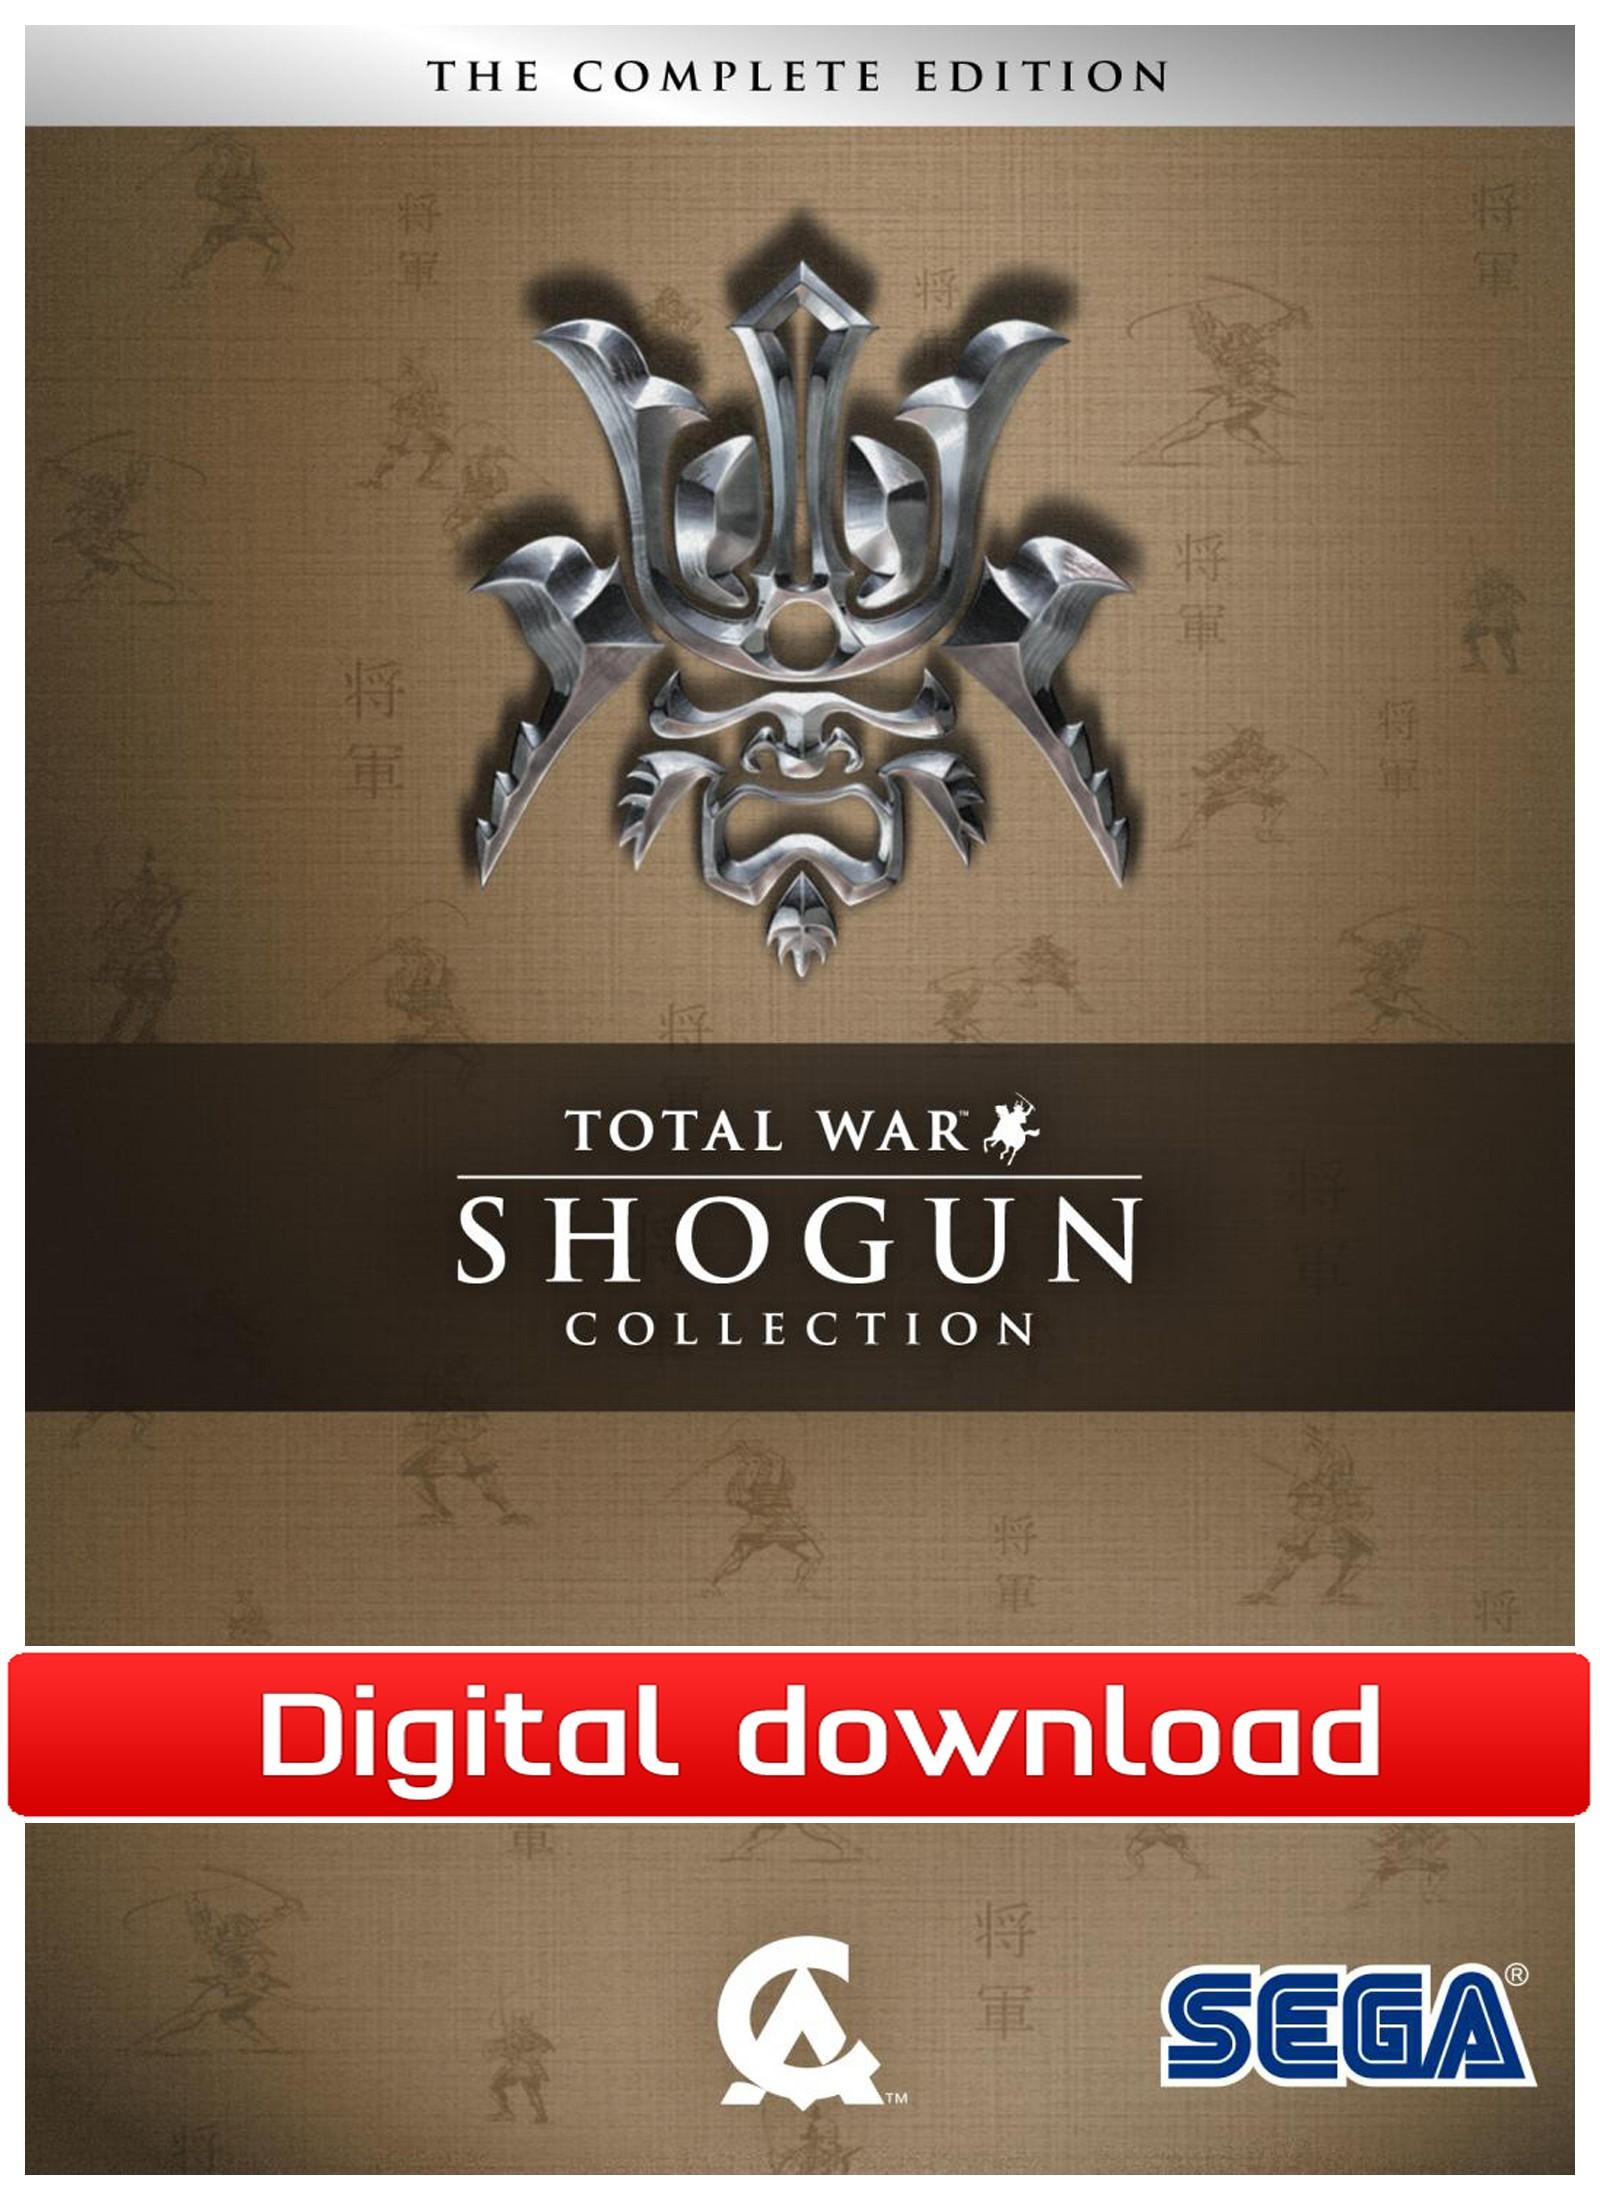 37683 : Shogun: Total War - Collection (PC nedlastning)